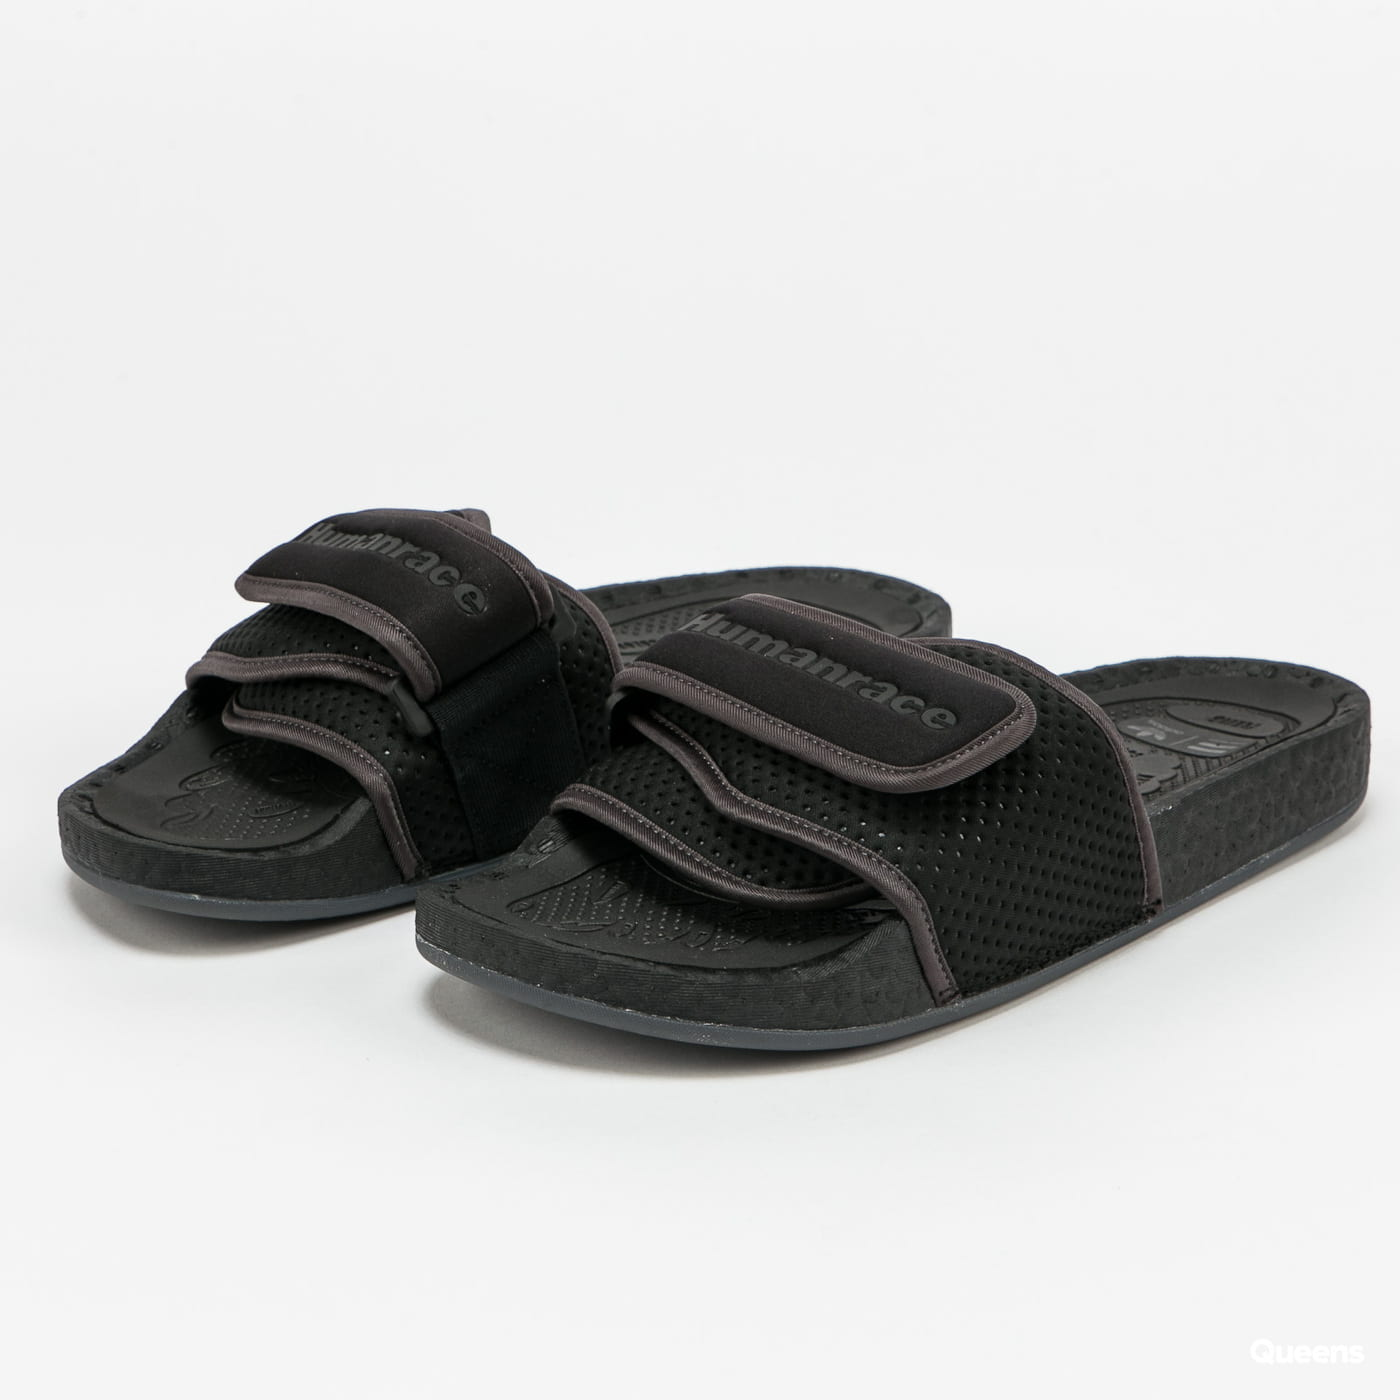 adidas Originals Chancletas HU cblack / utiblk / cblack